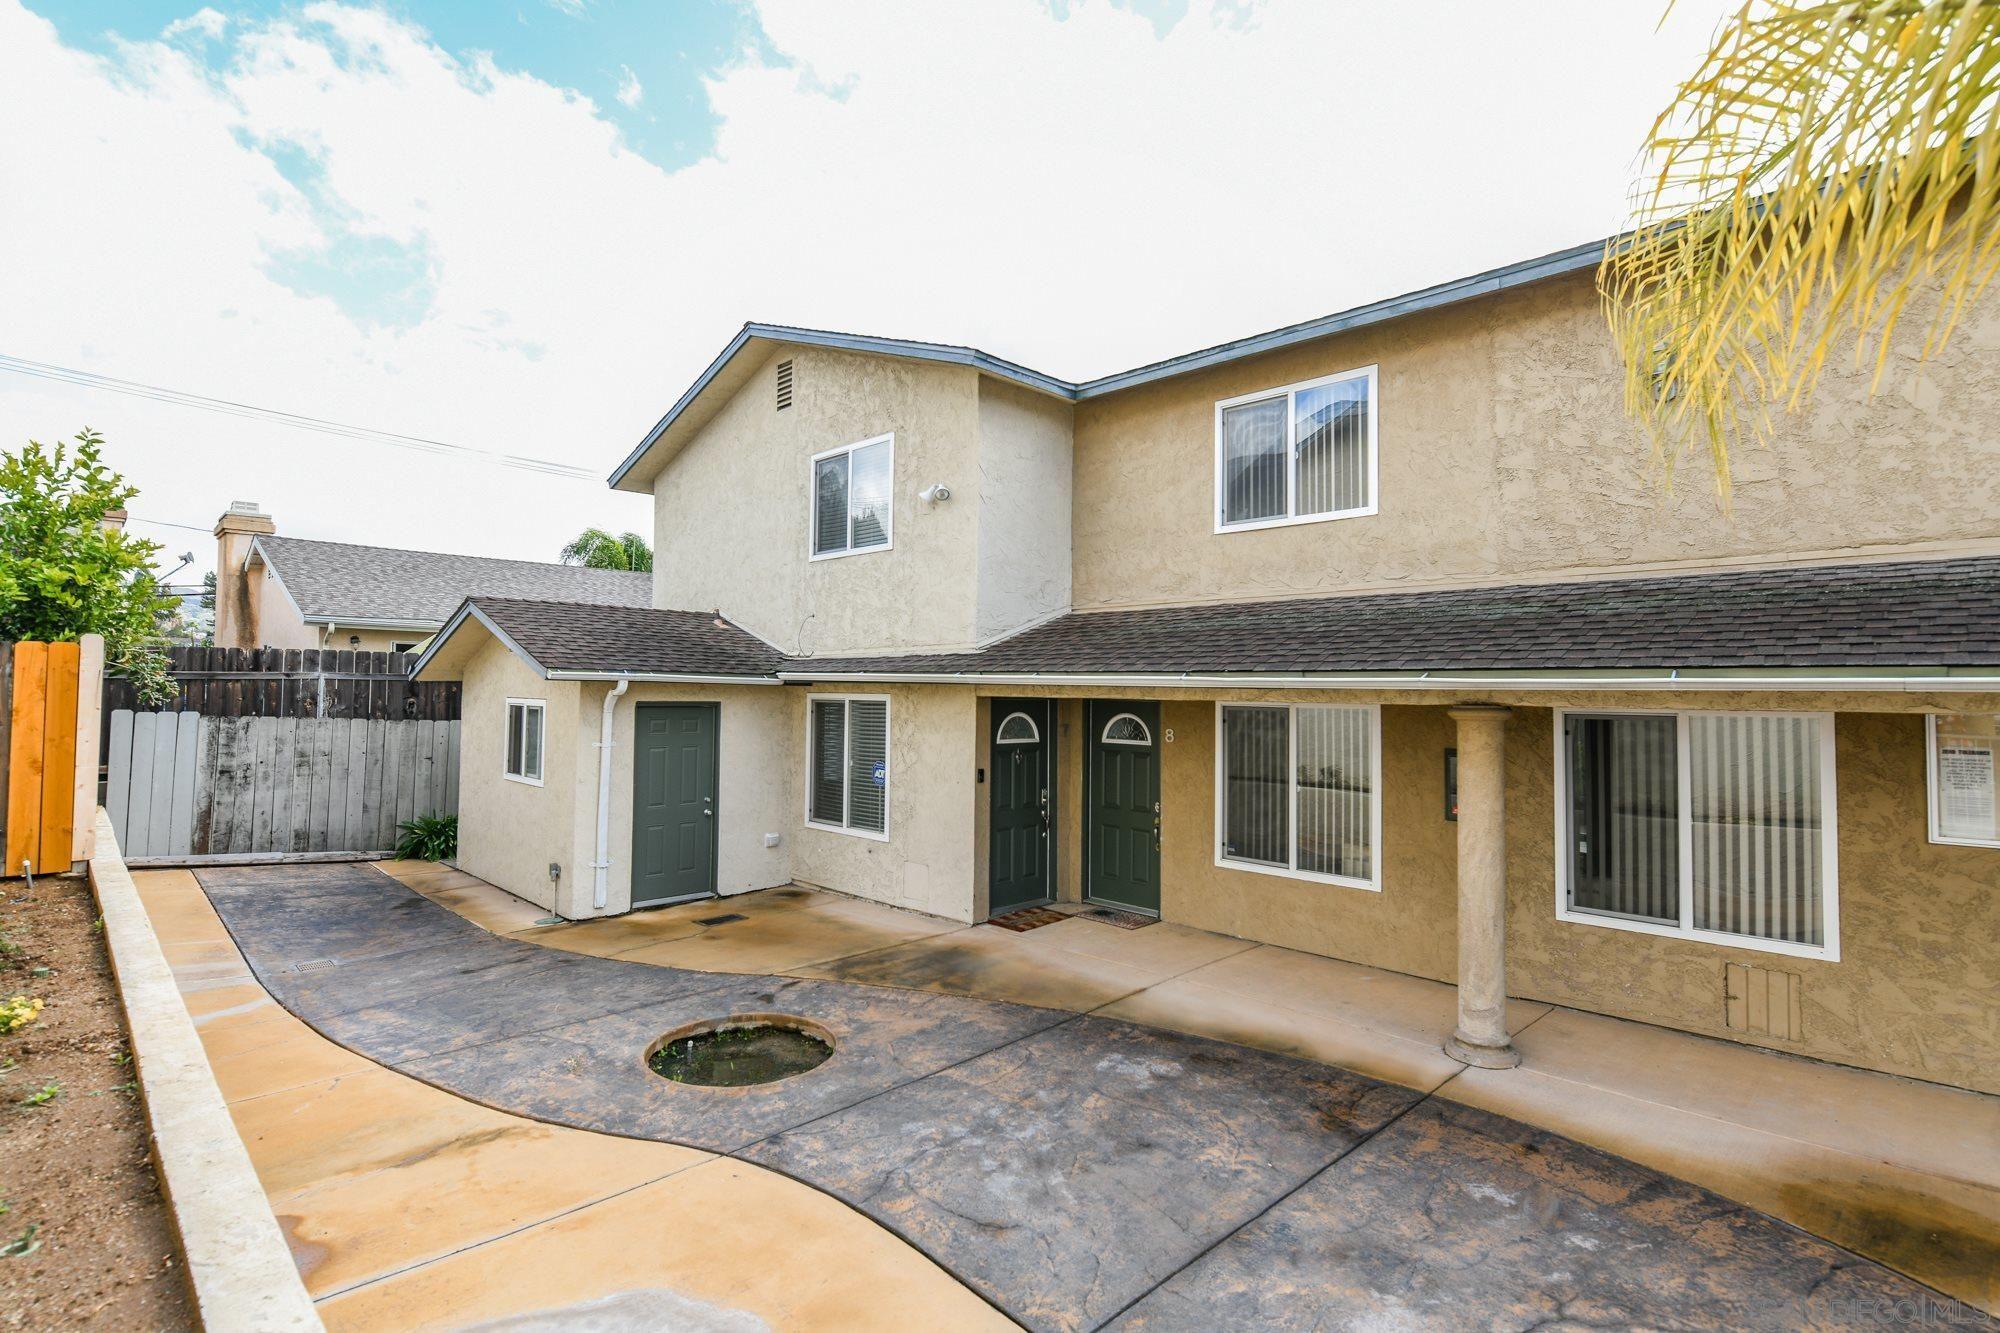 Main Photo: EL CAJON Condo for sale : 2 bedrooms : 1491 Peach Ave #7